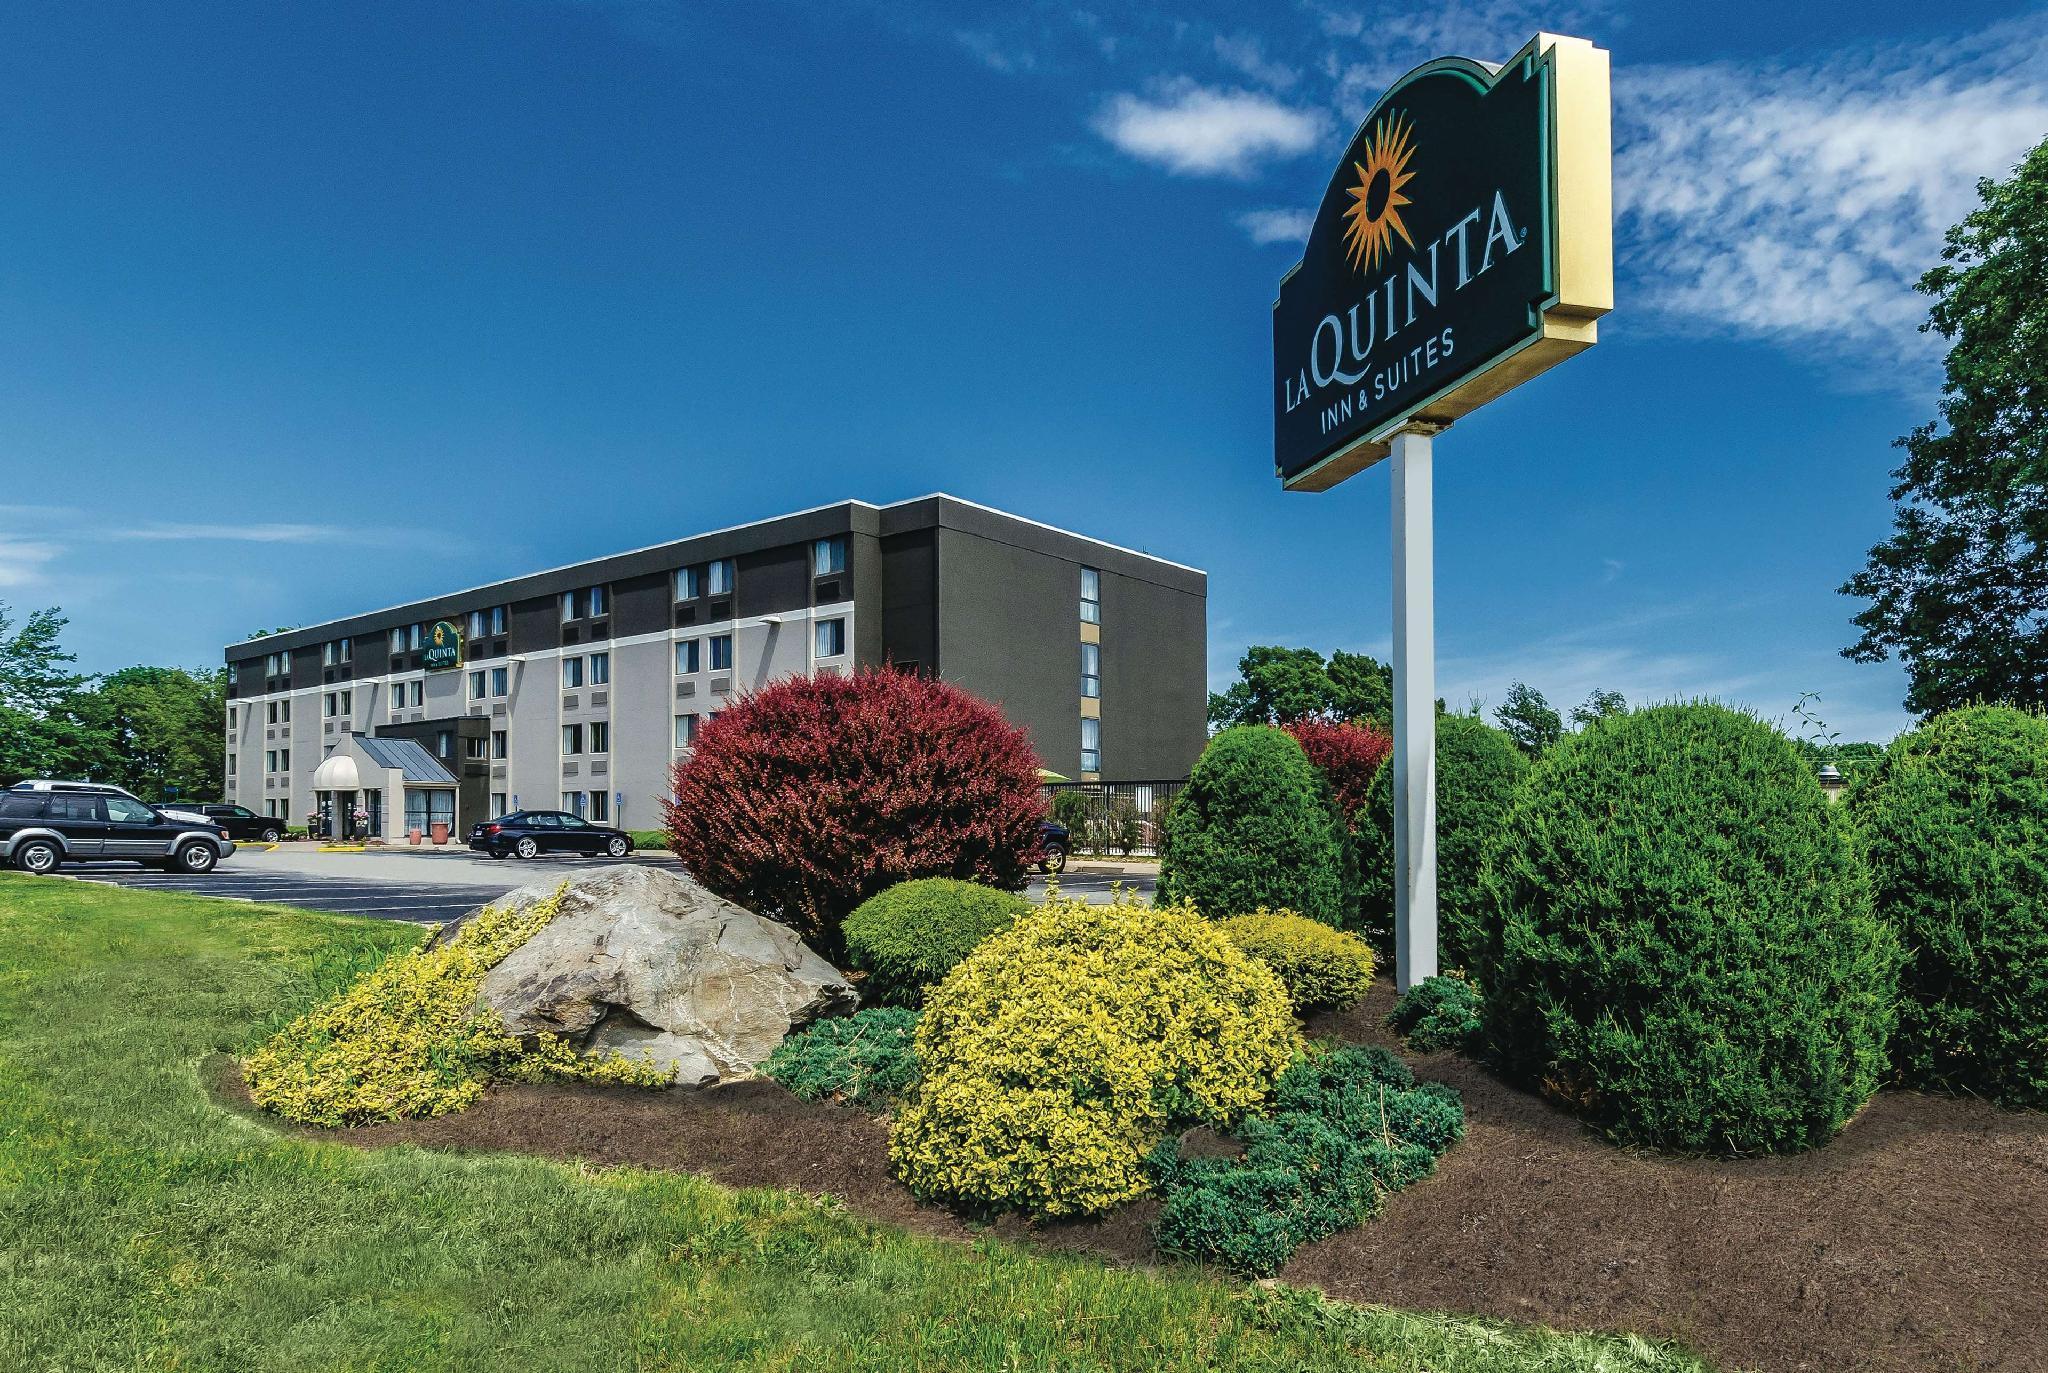 La Quinta Inn & Suites by Wyndham Warwick Providence Airport